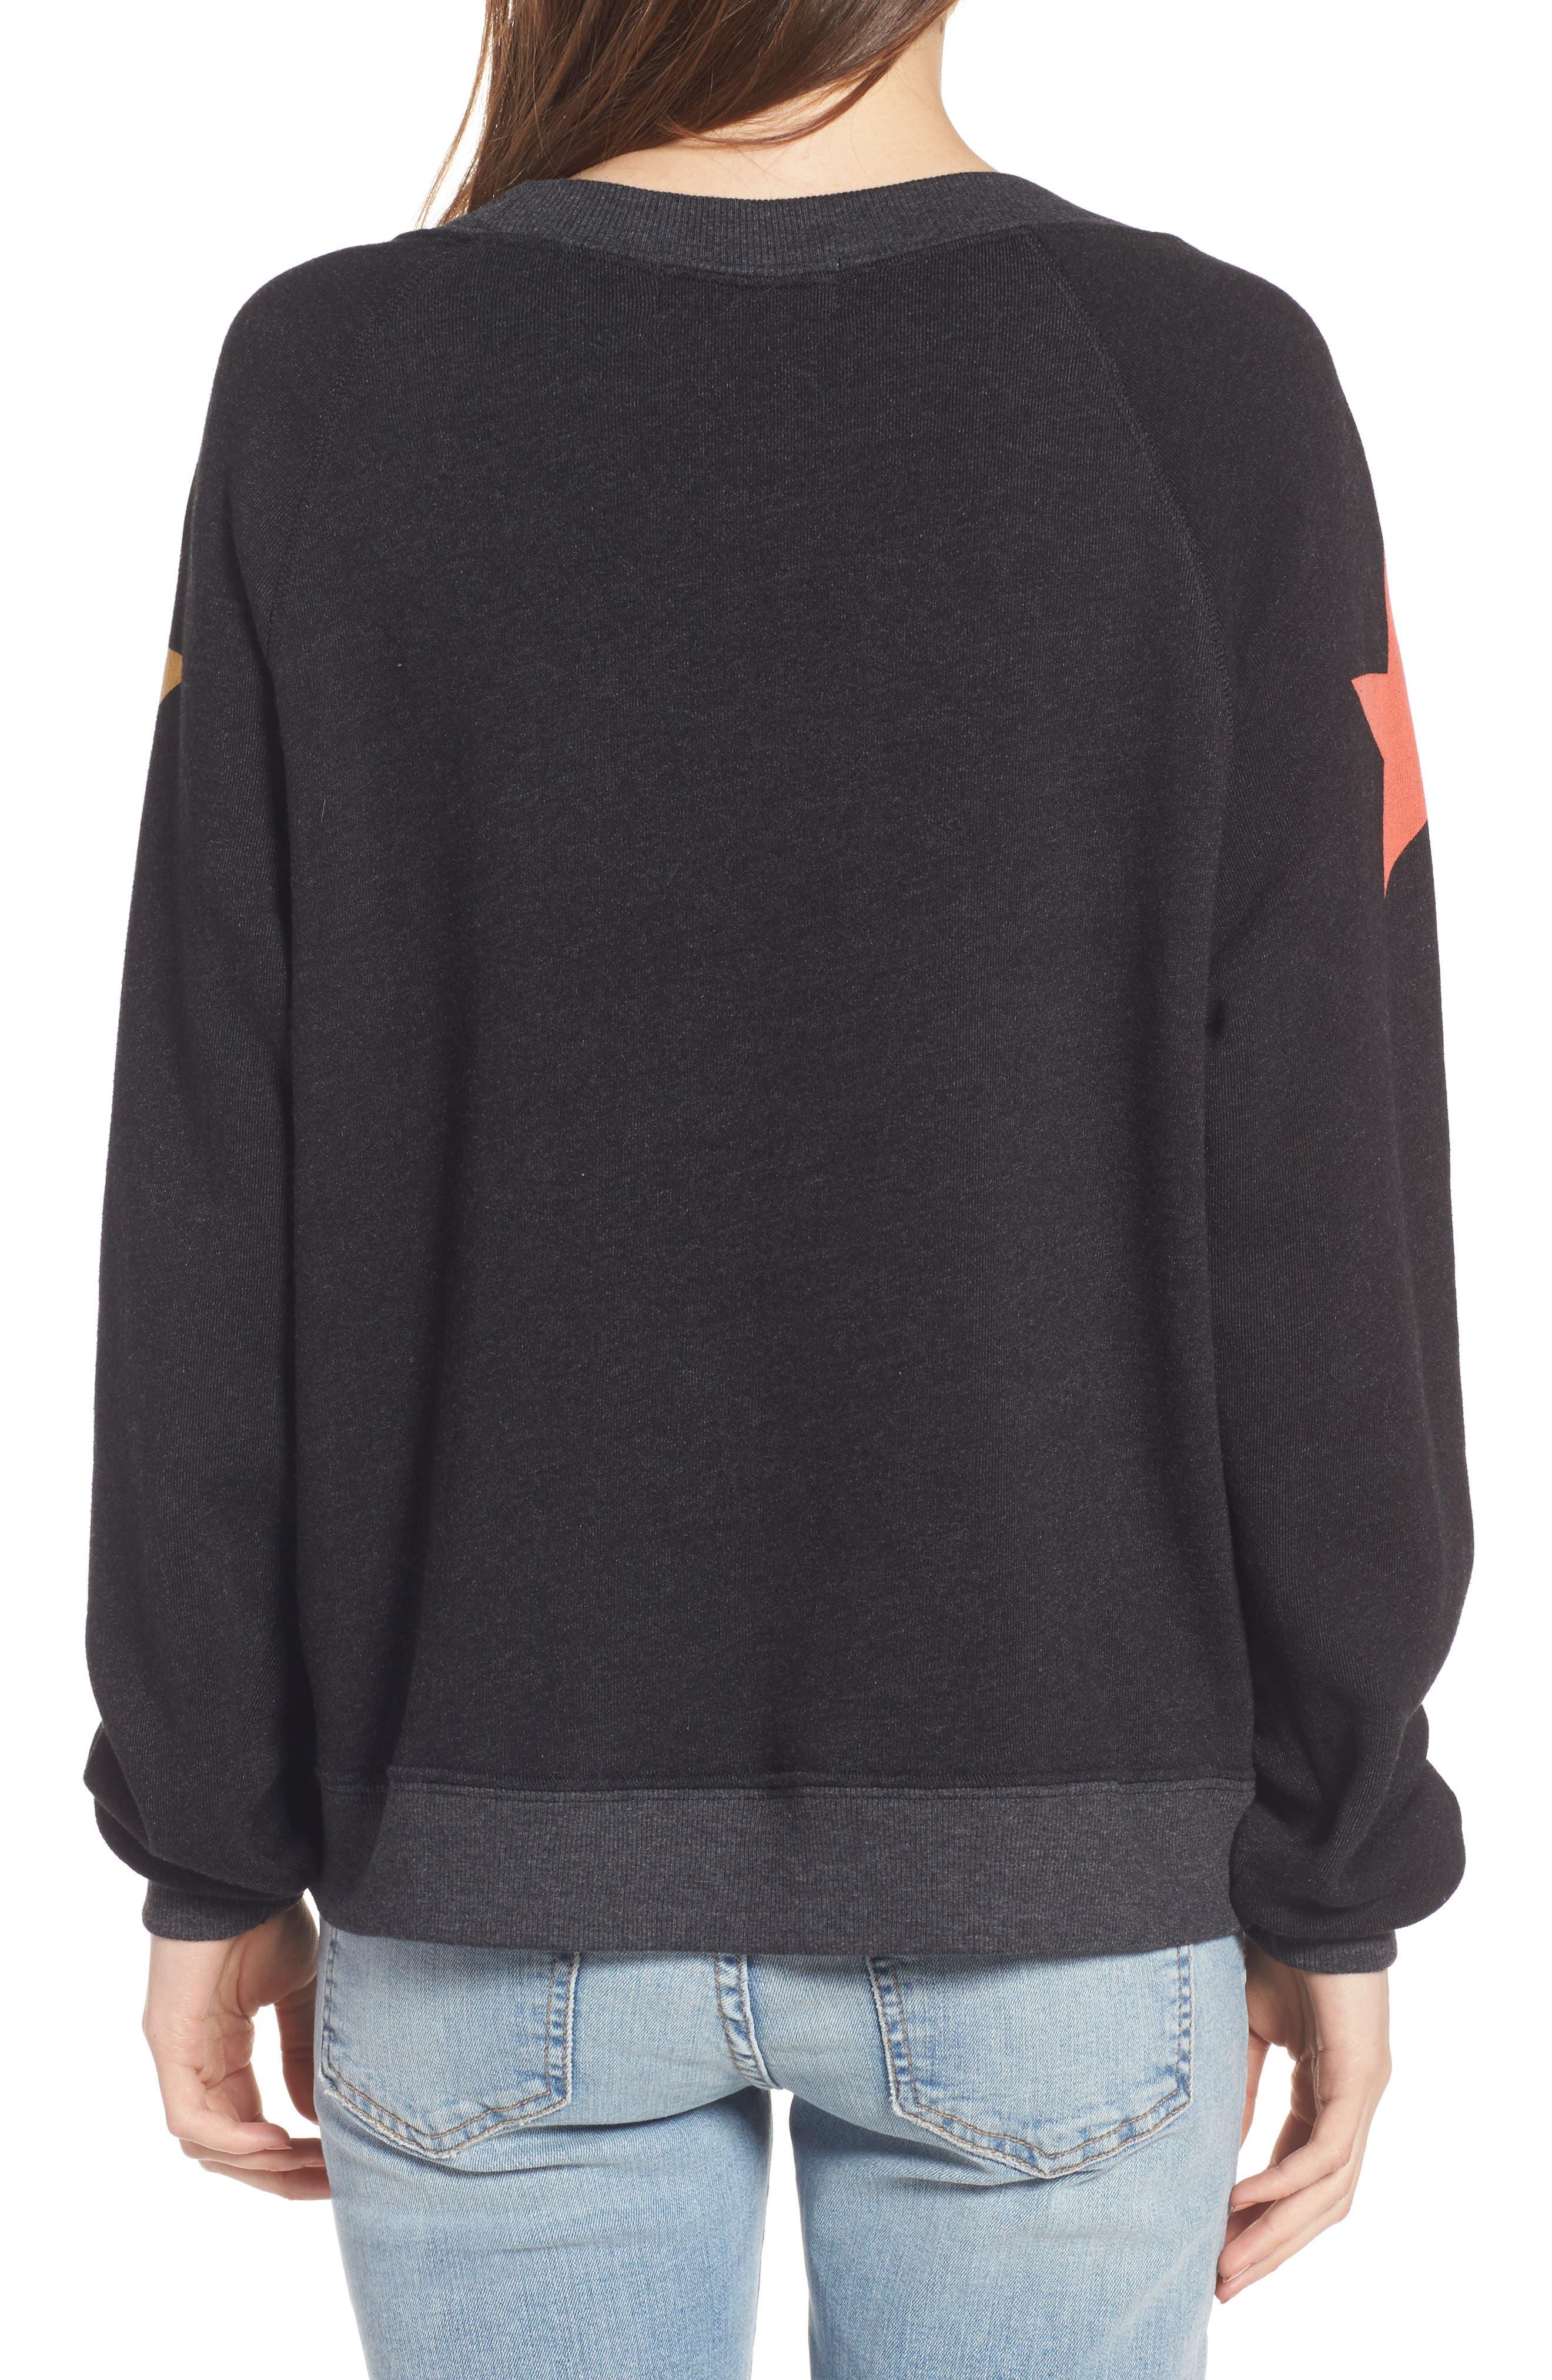 Arcade Stars Sommers Sweatshirt,                             Alternate thumbnail 3, color,                             Heathered Black